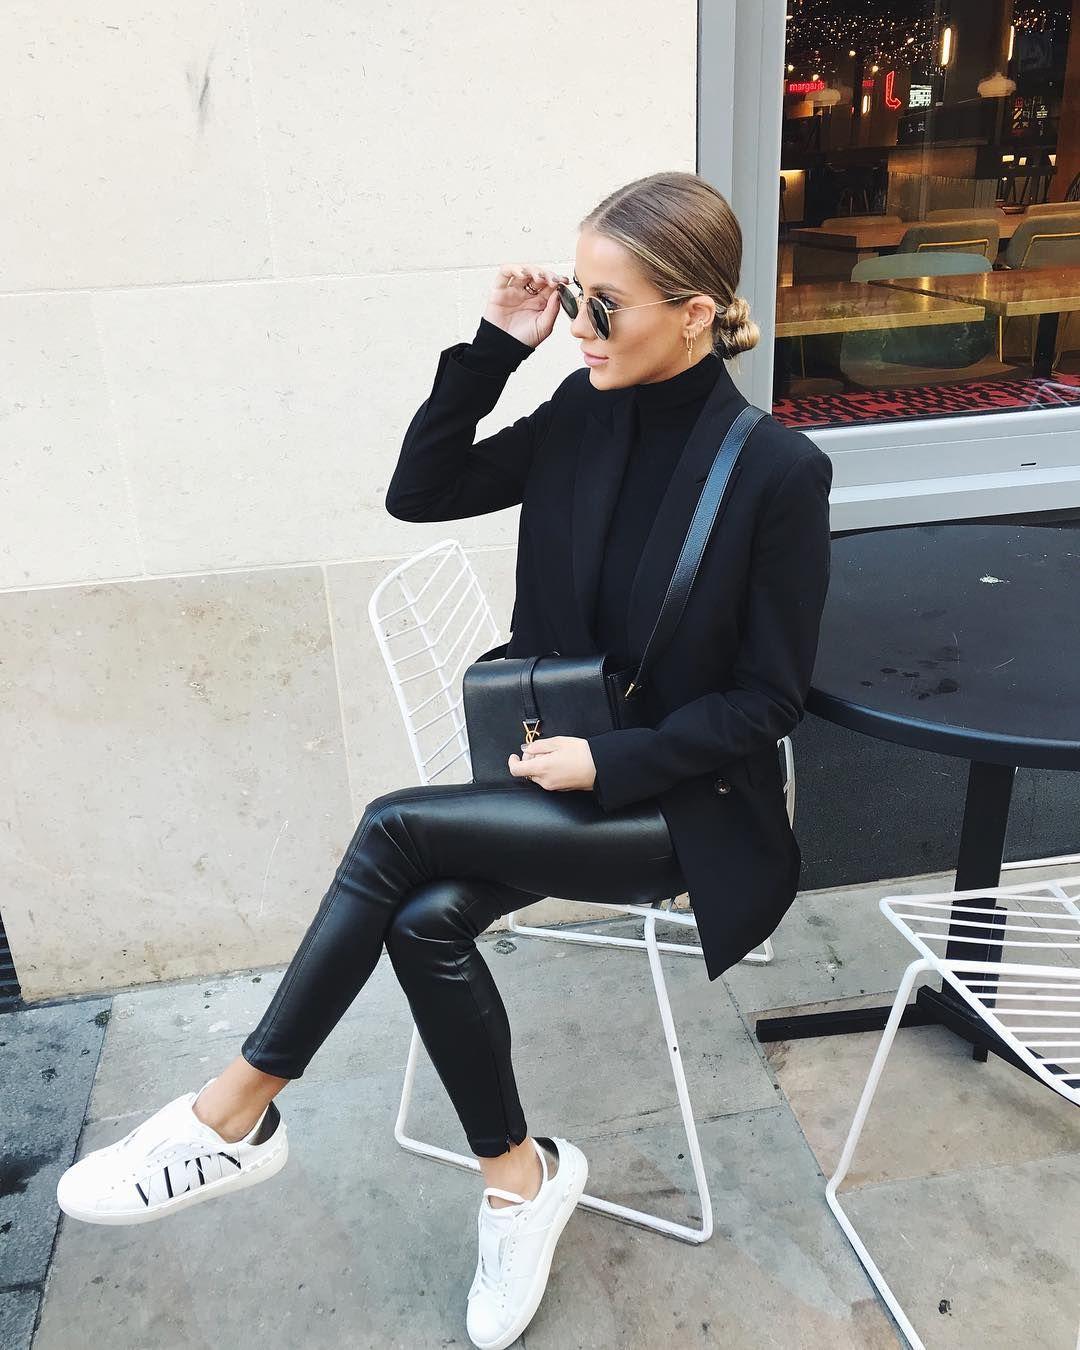 legging couro + blusa preta gola + blazer + tenis branco #branddresses